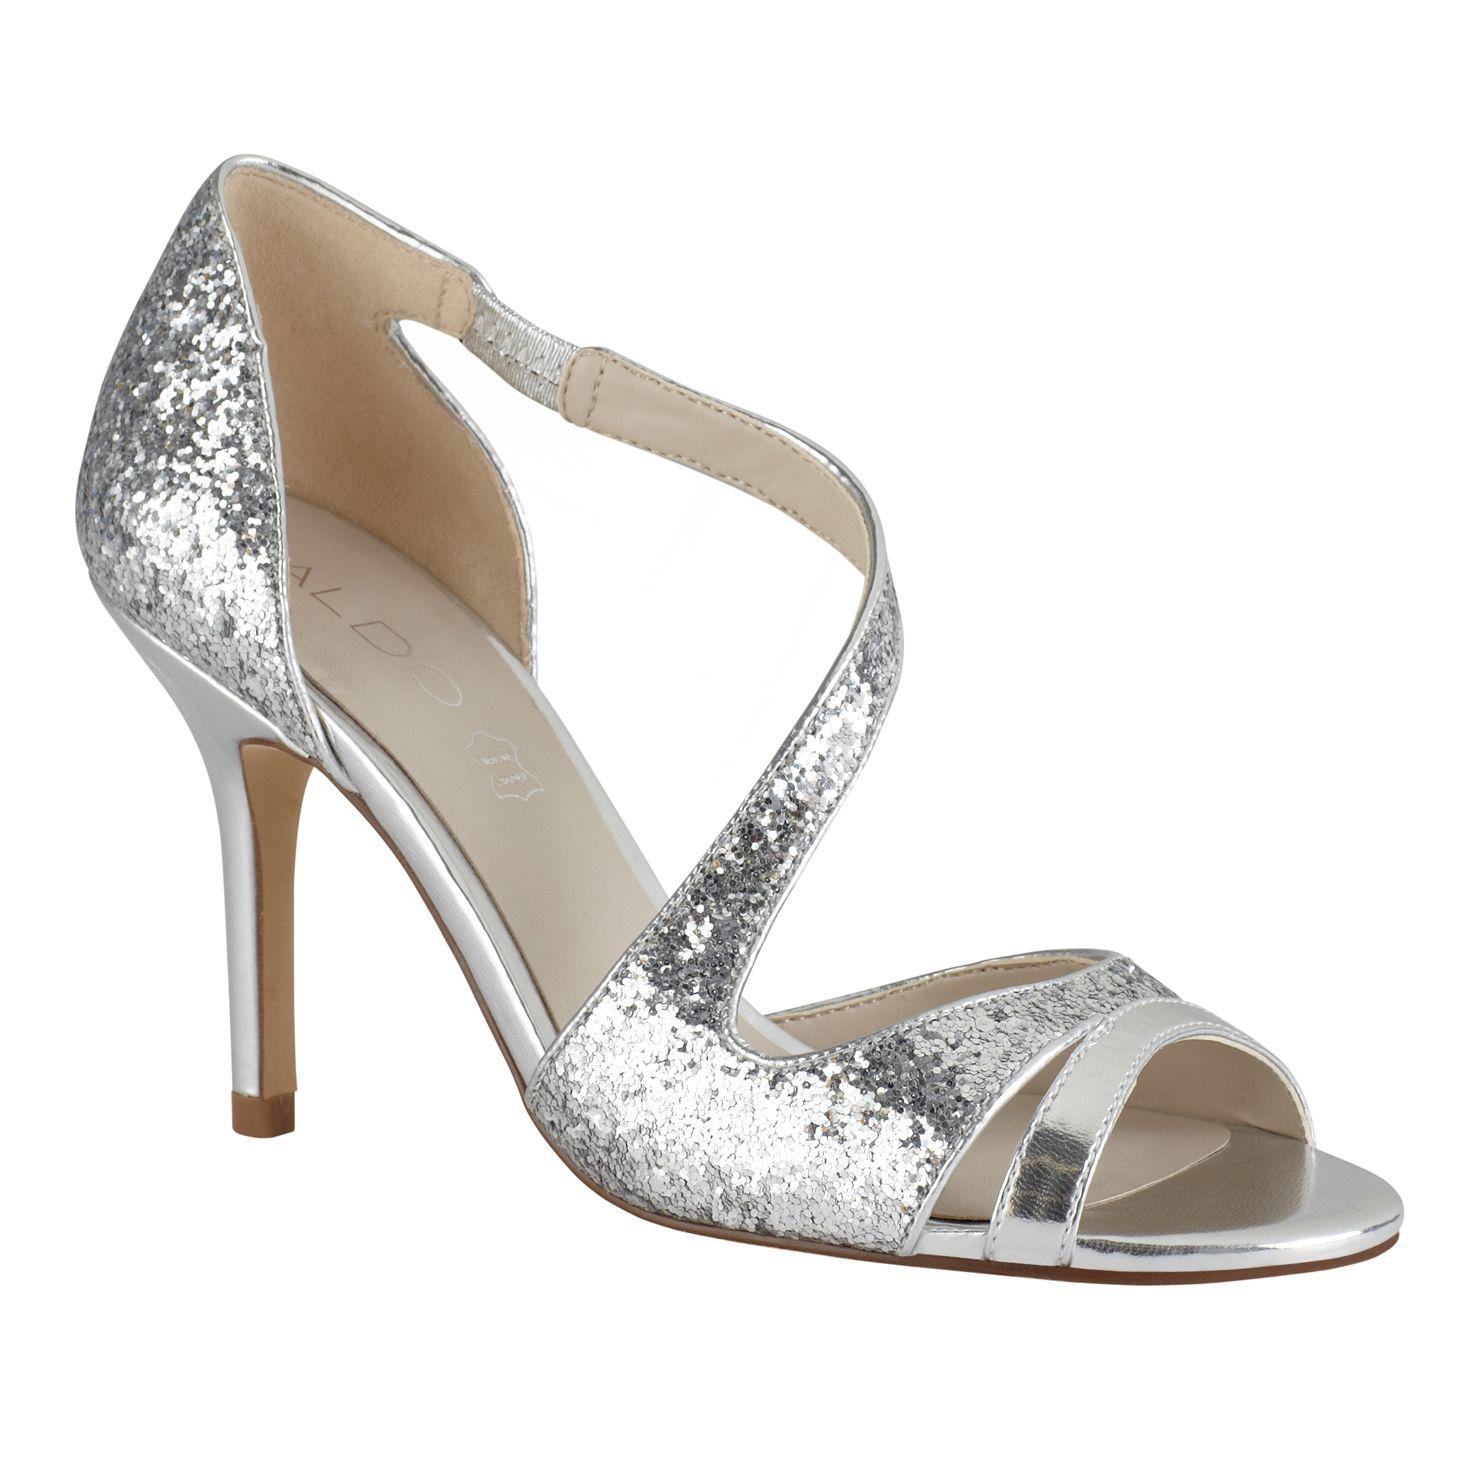 Aldo Legaynna Strappy Stilleto Sandals In Silver